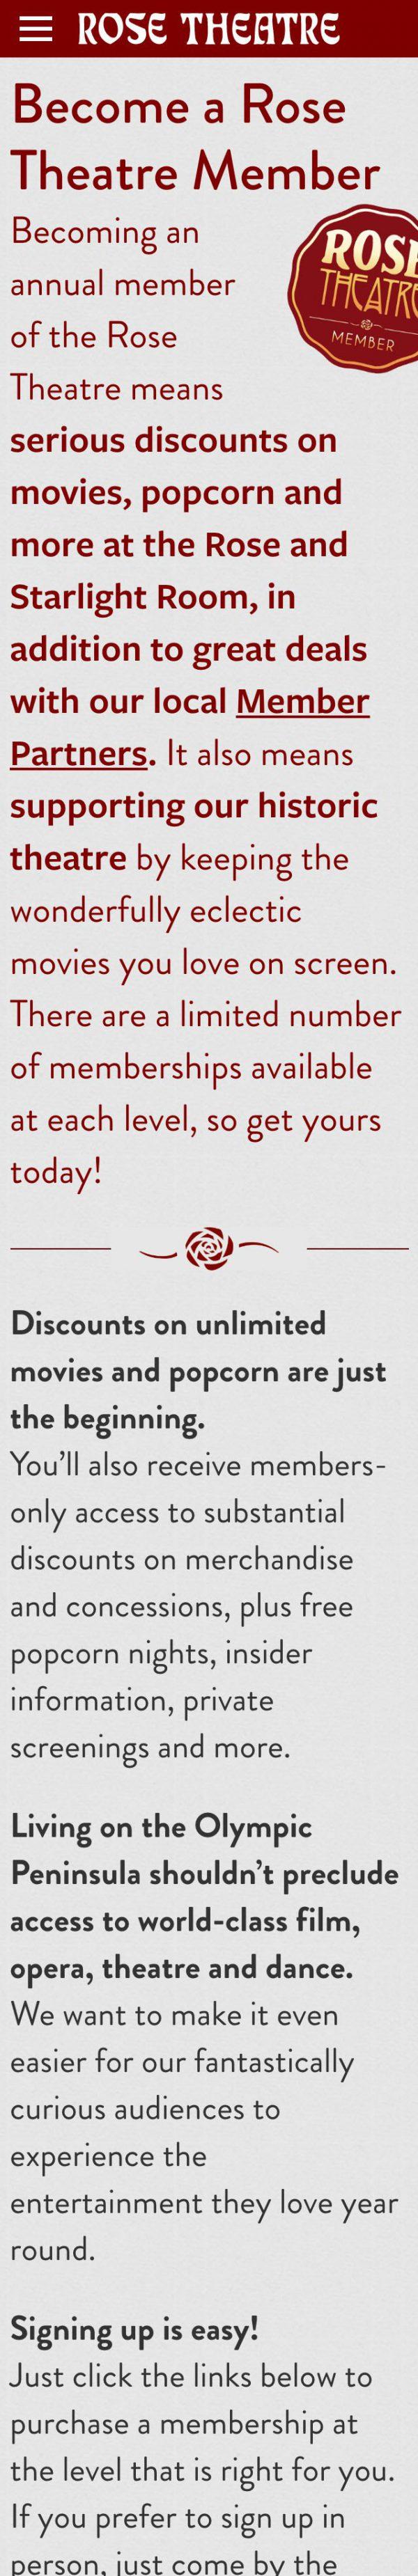 Screenshot of the Rose Theatre mobile website's Membership landing page